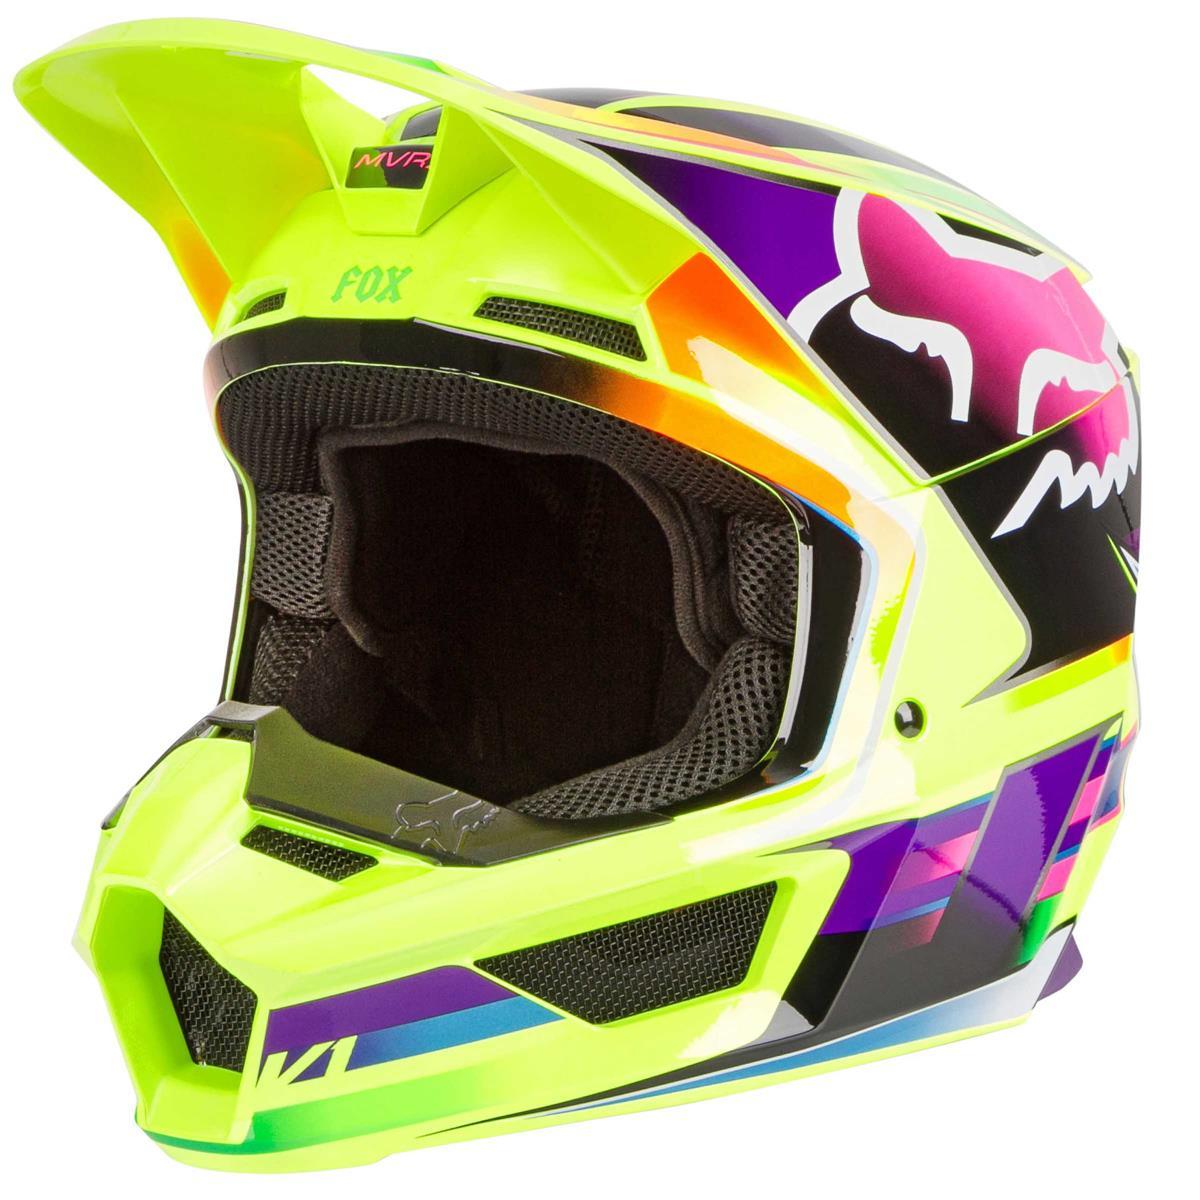 Fox Mx Helmet V1 Gama Yellow Maciag Offroad